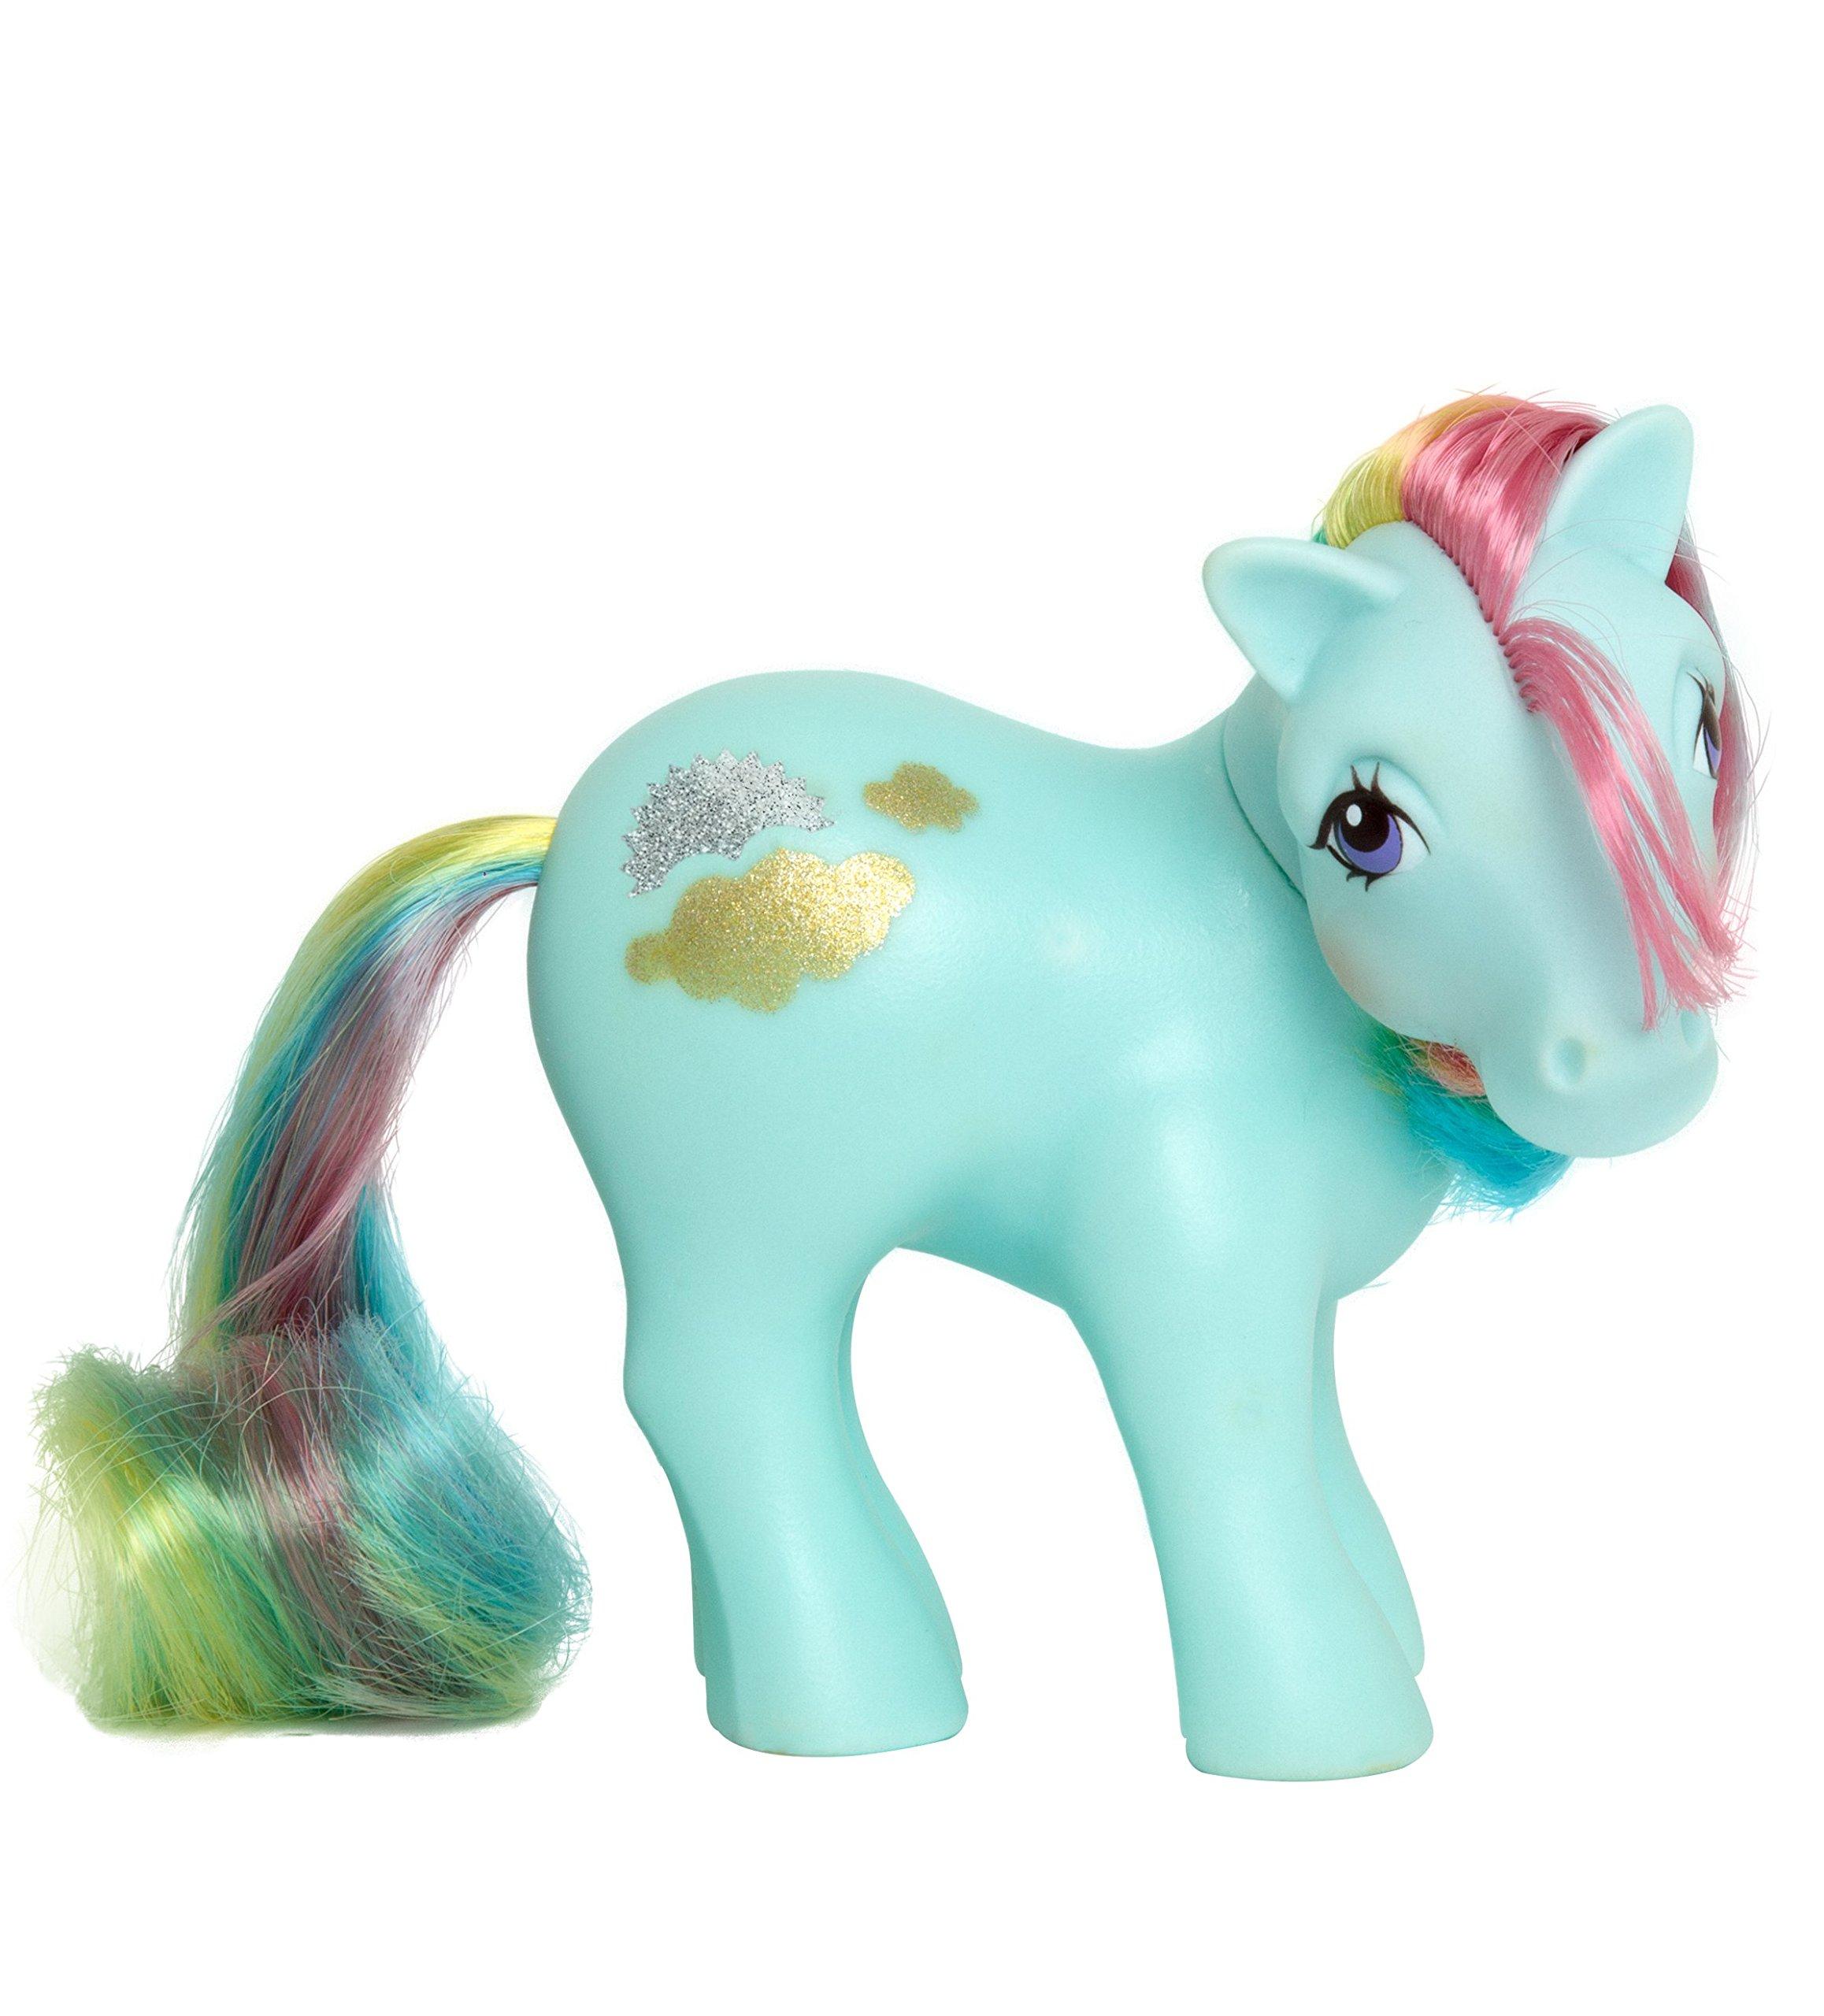 Basic Fun My Little Rainbow Retro Pony - Sunlight,